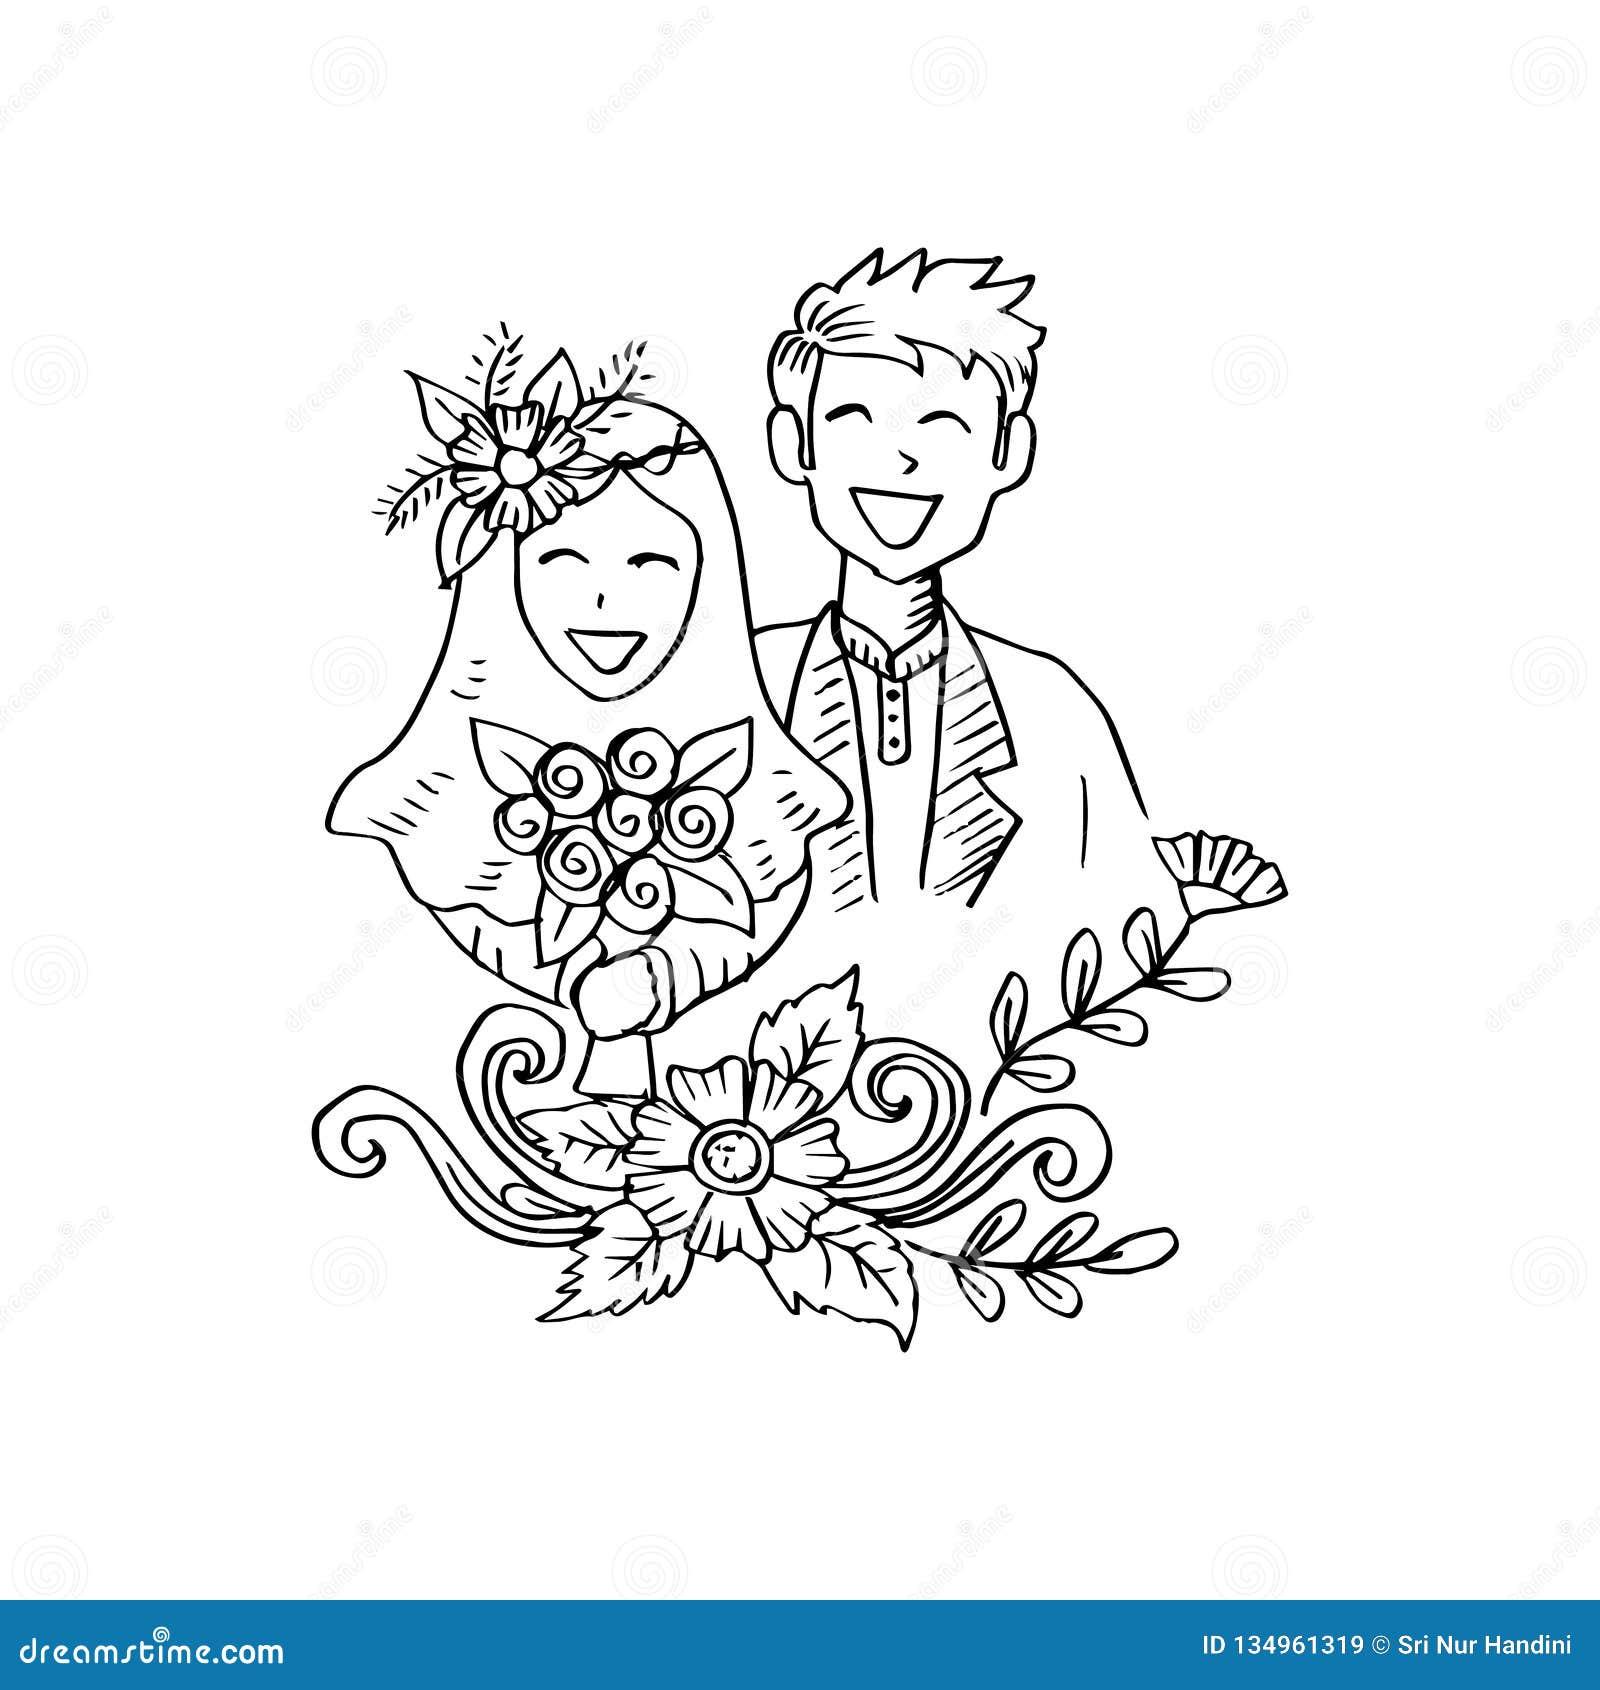 Muslim couple wedding card stock illustration